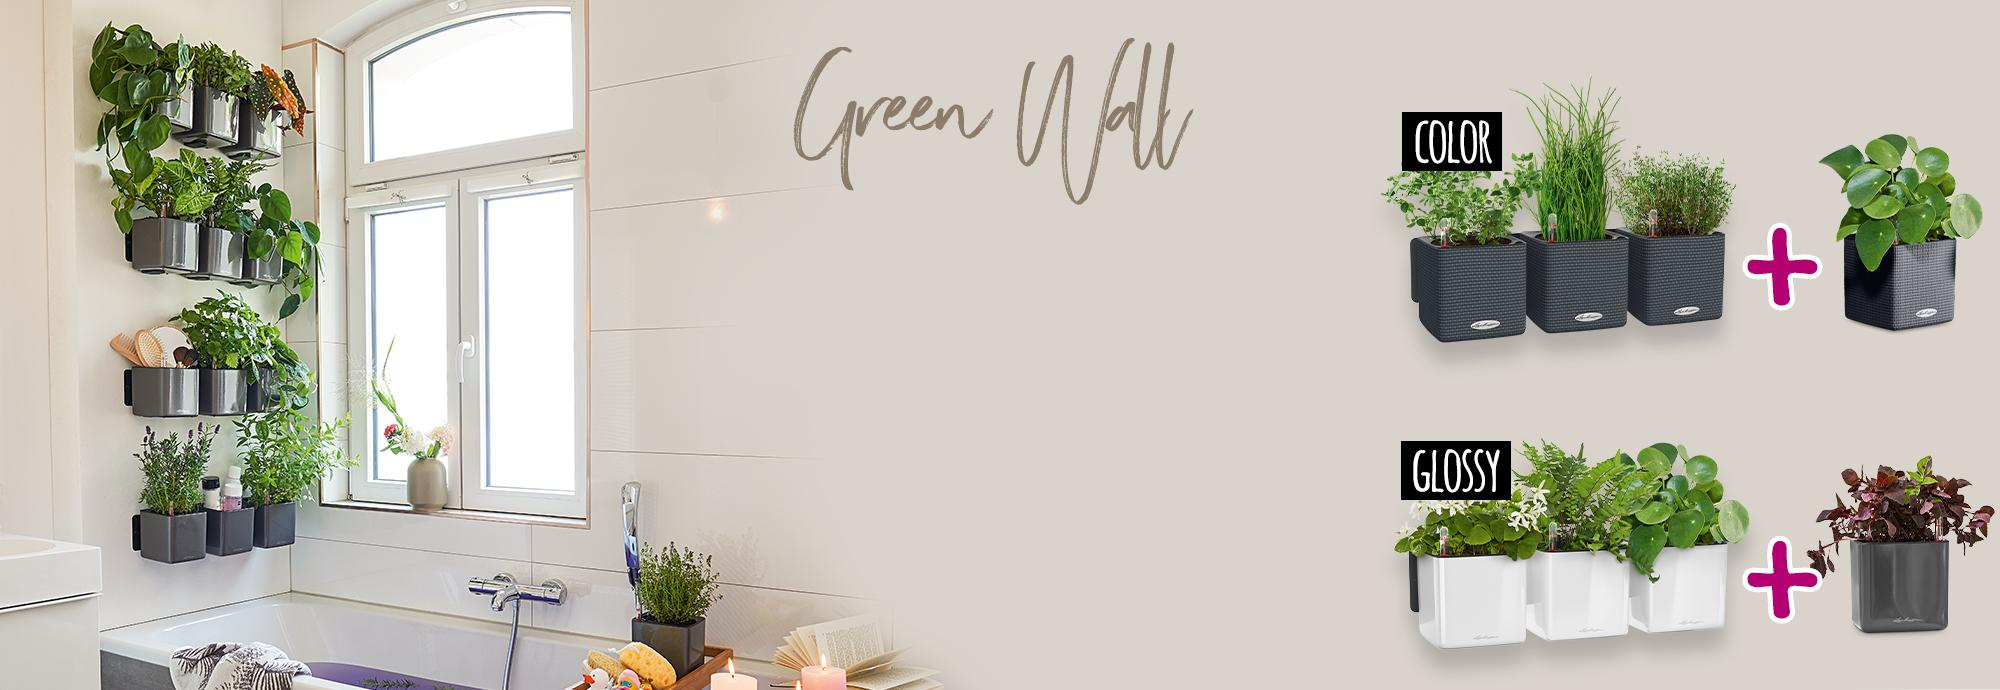 Con la compra de un Green Wall llévate una CUBE 14 gratis